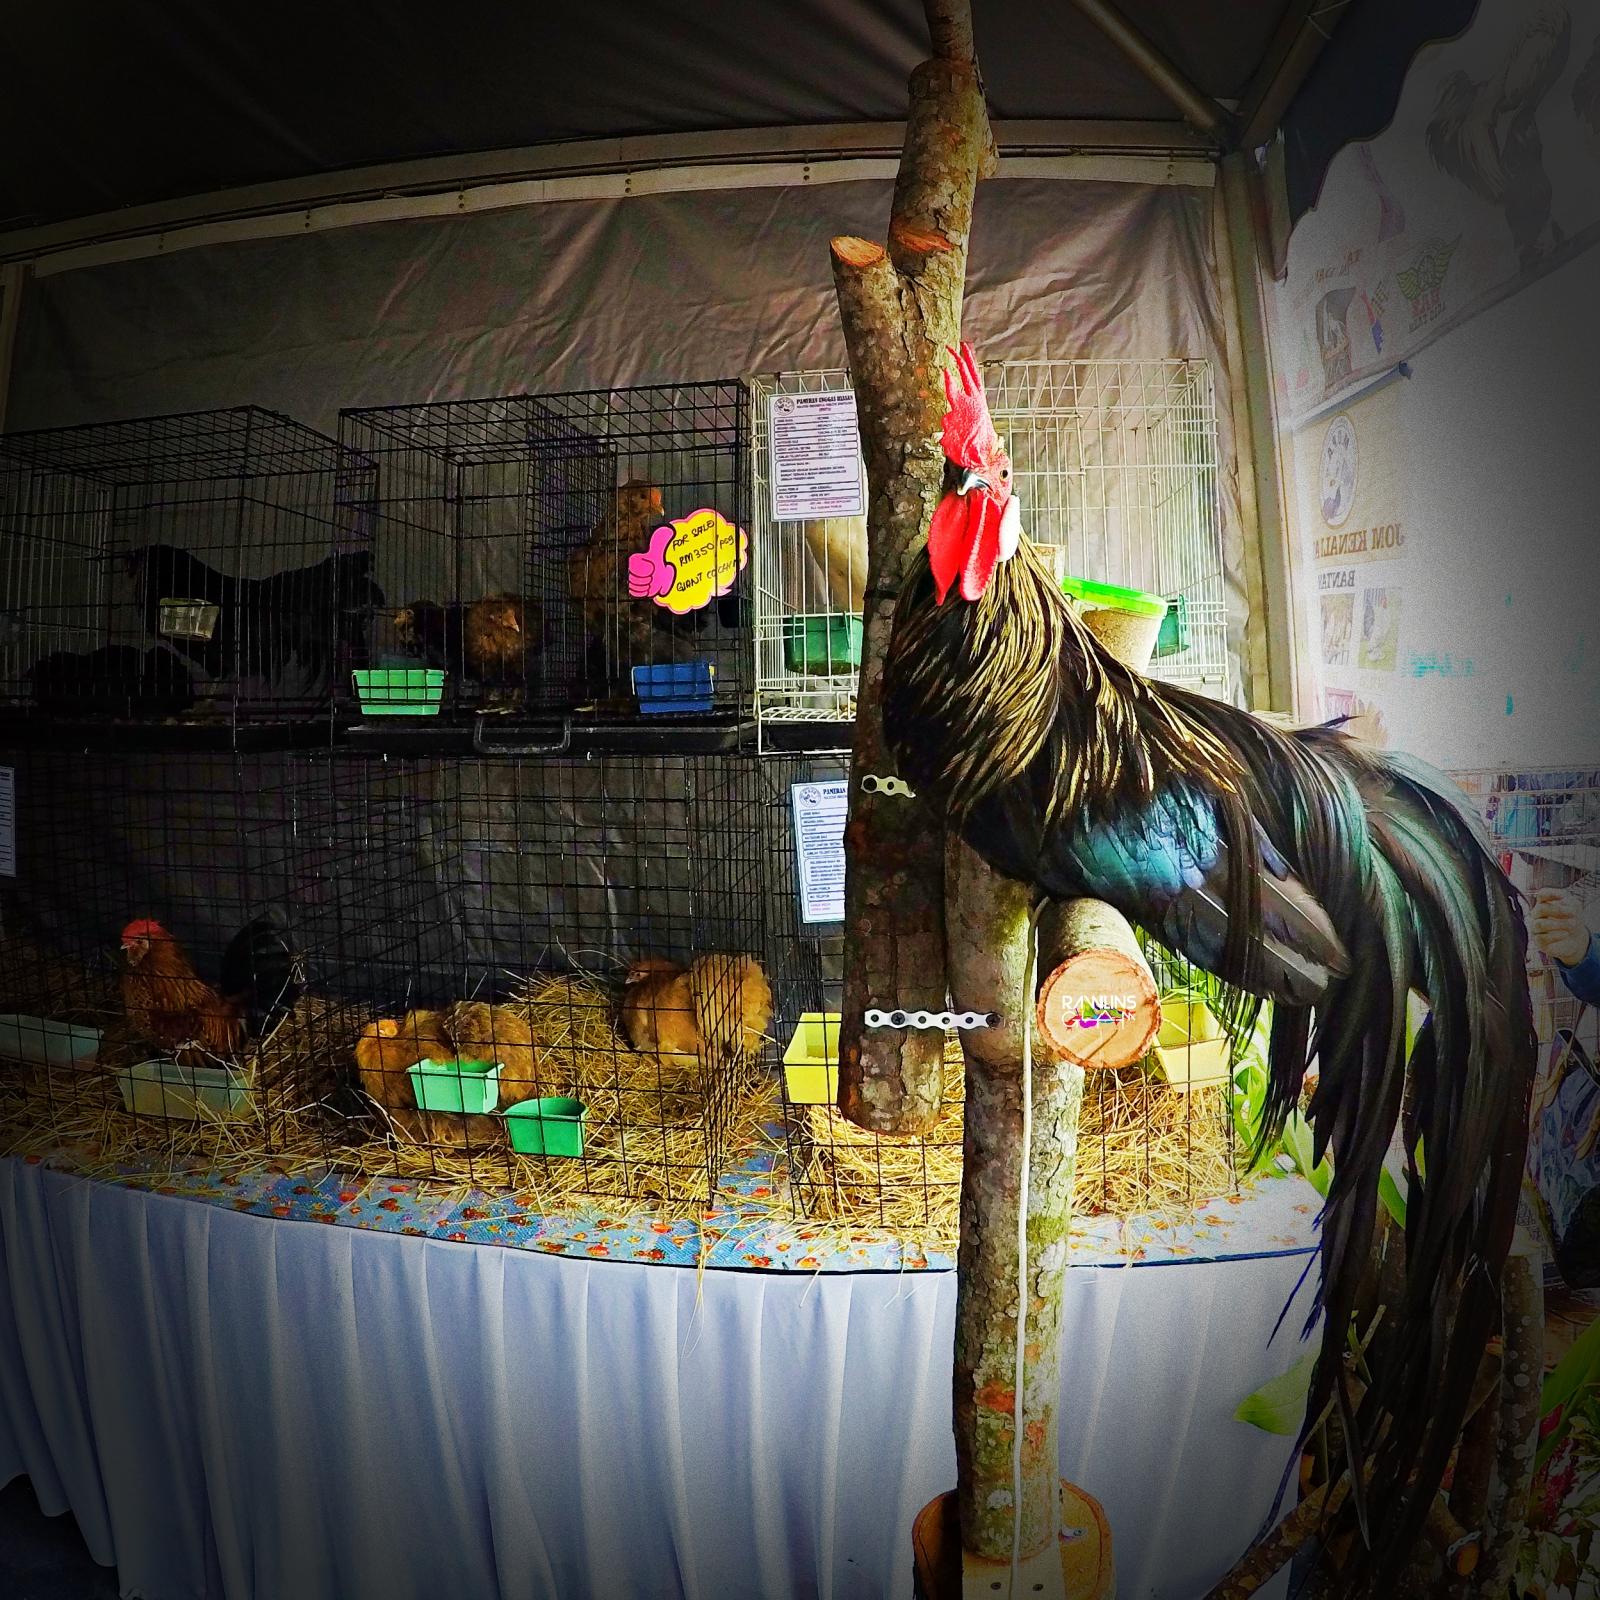 Dato' Sri Ahmad Shabery Cheek, HPPNK 2017, MAEPS, Malaysia Food Festival, Our Food Our Future, MFF 2017, Hari Peladang, Penternak & Nelayan Kebangsaan, Rawlins GLAM,